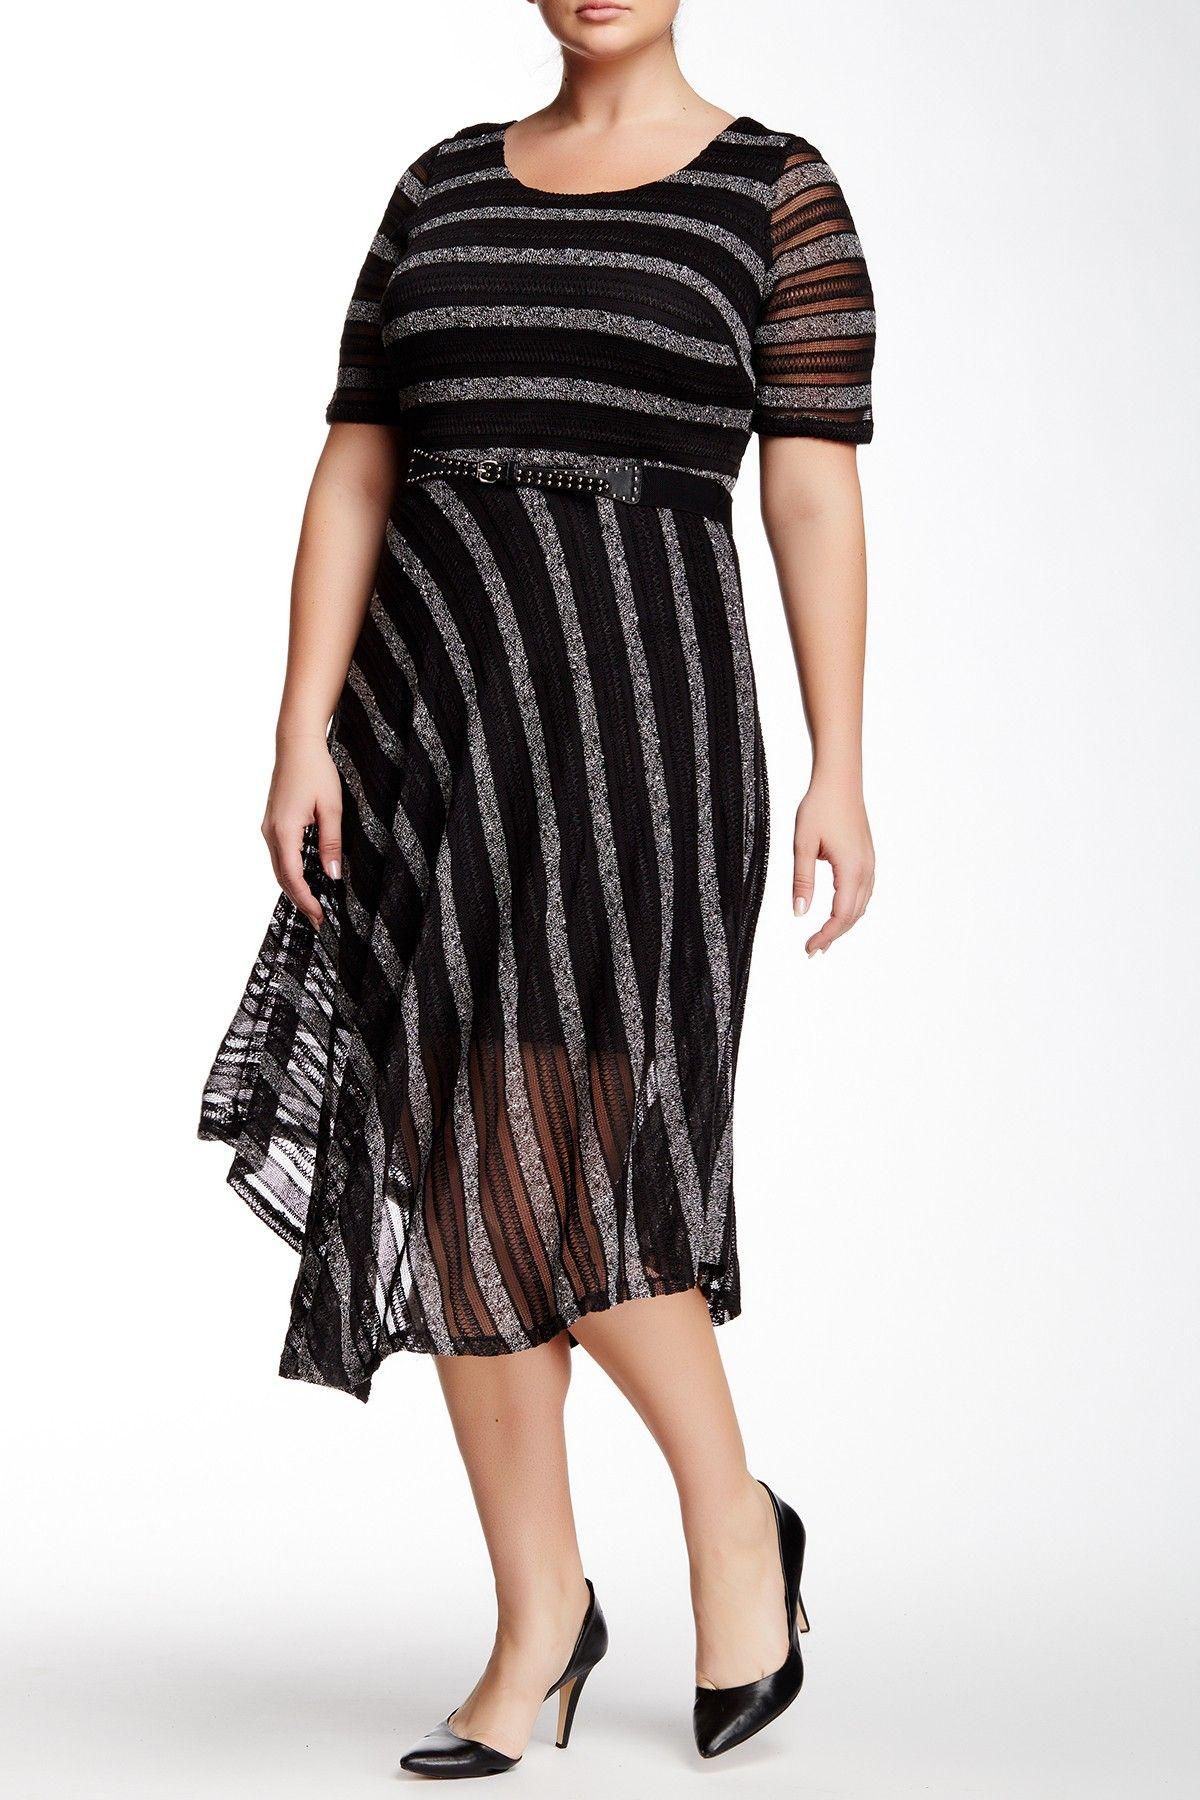 Elbow Sleeve Short Dress (Plus Size) by Sandra Darren on @nordstrom_rack